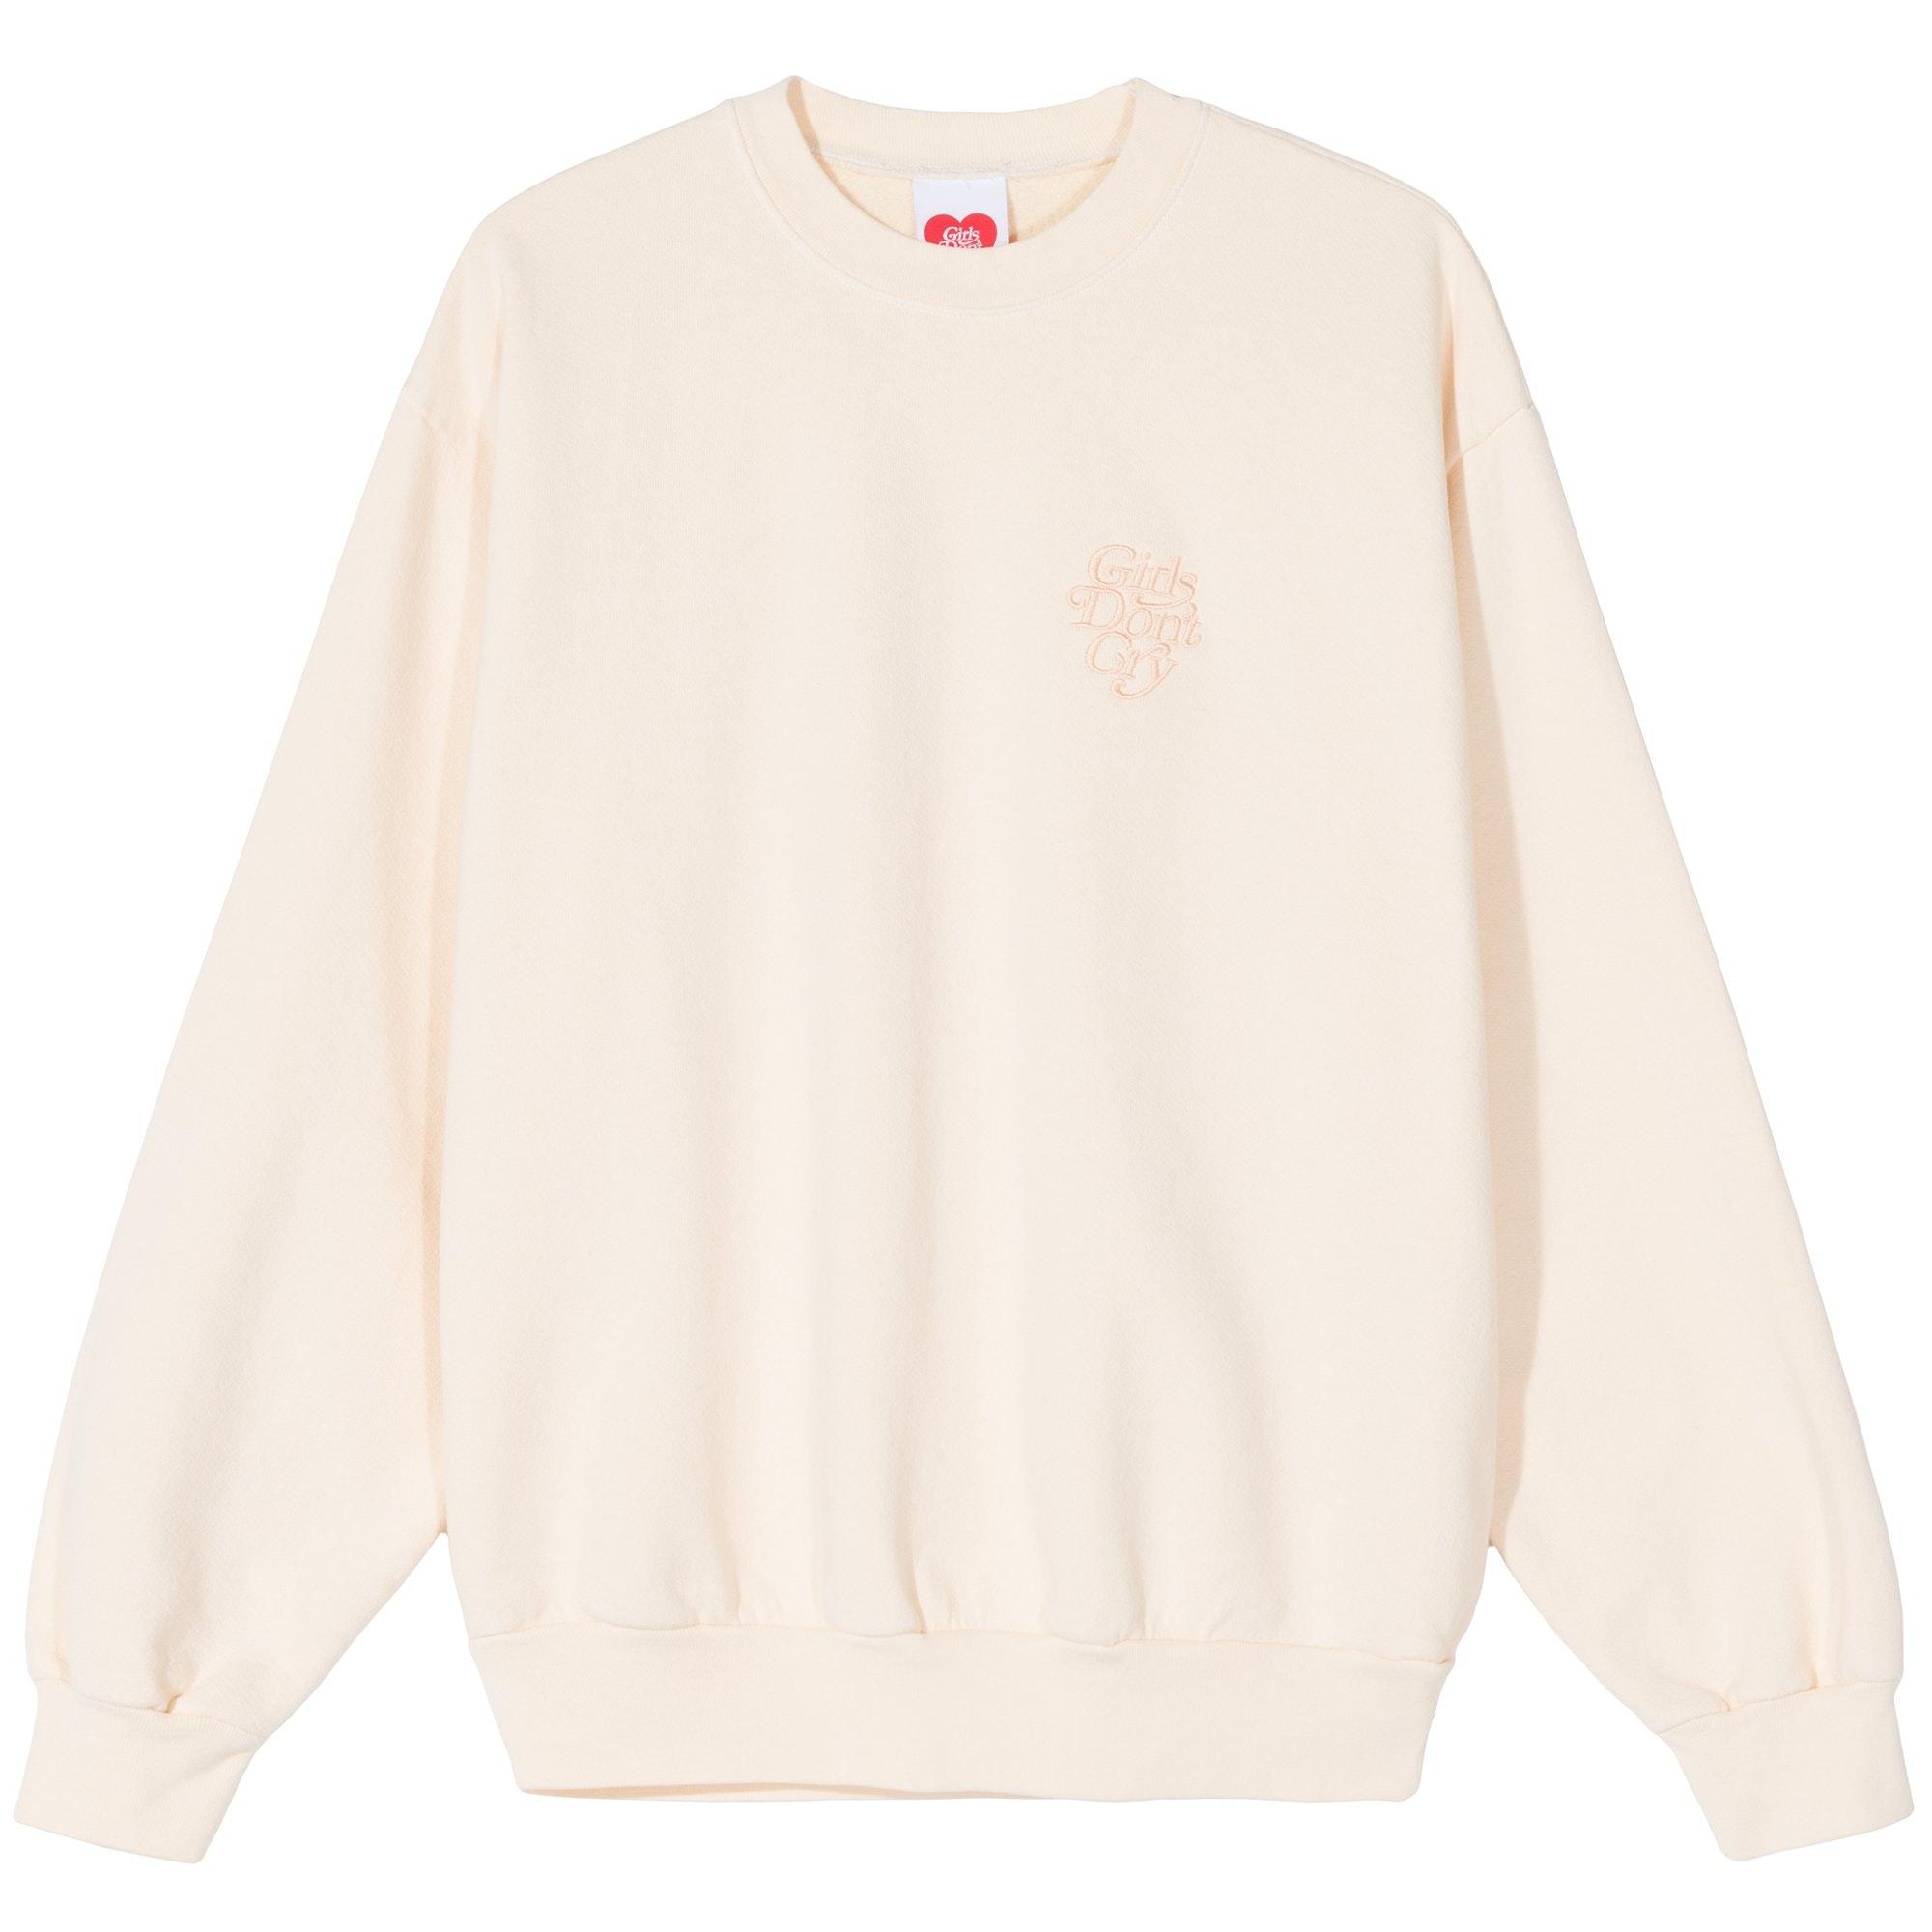 Girls Don't Cry Tonal Crewneck Sweatshirt Cream by Stock X